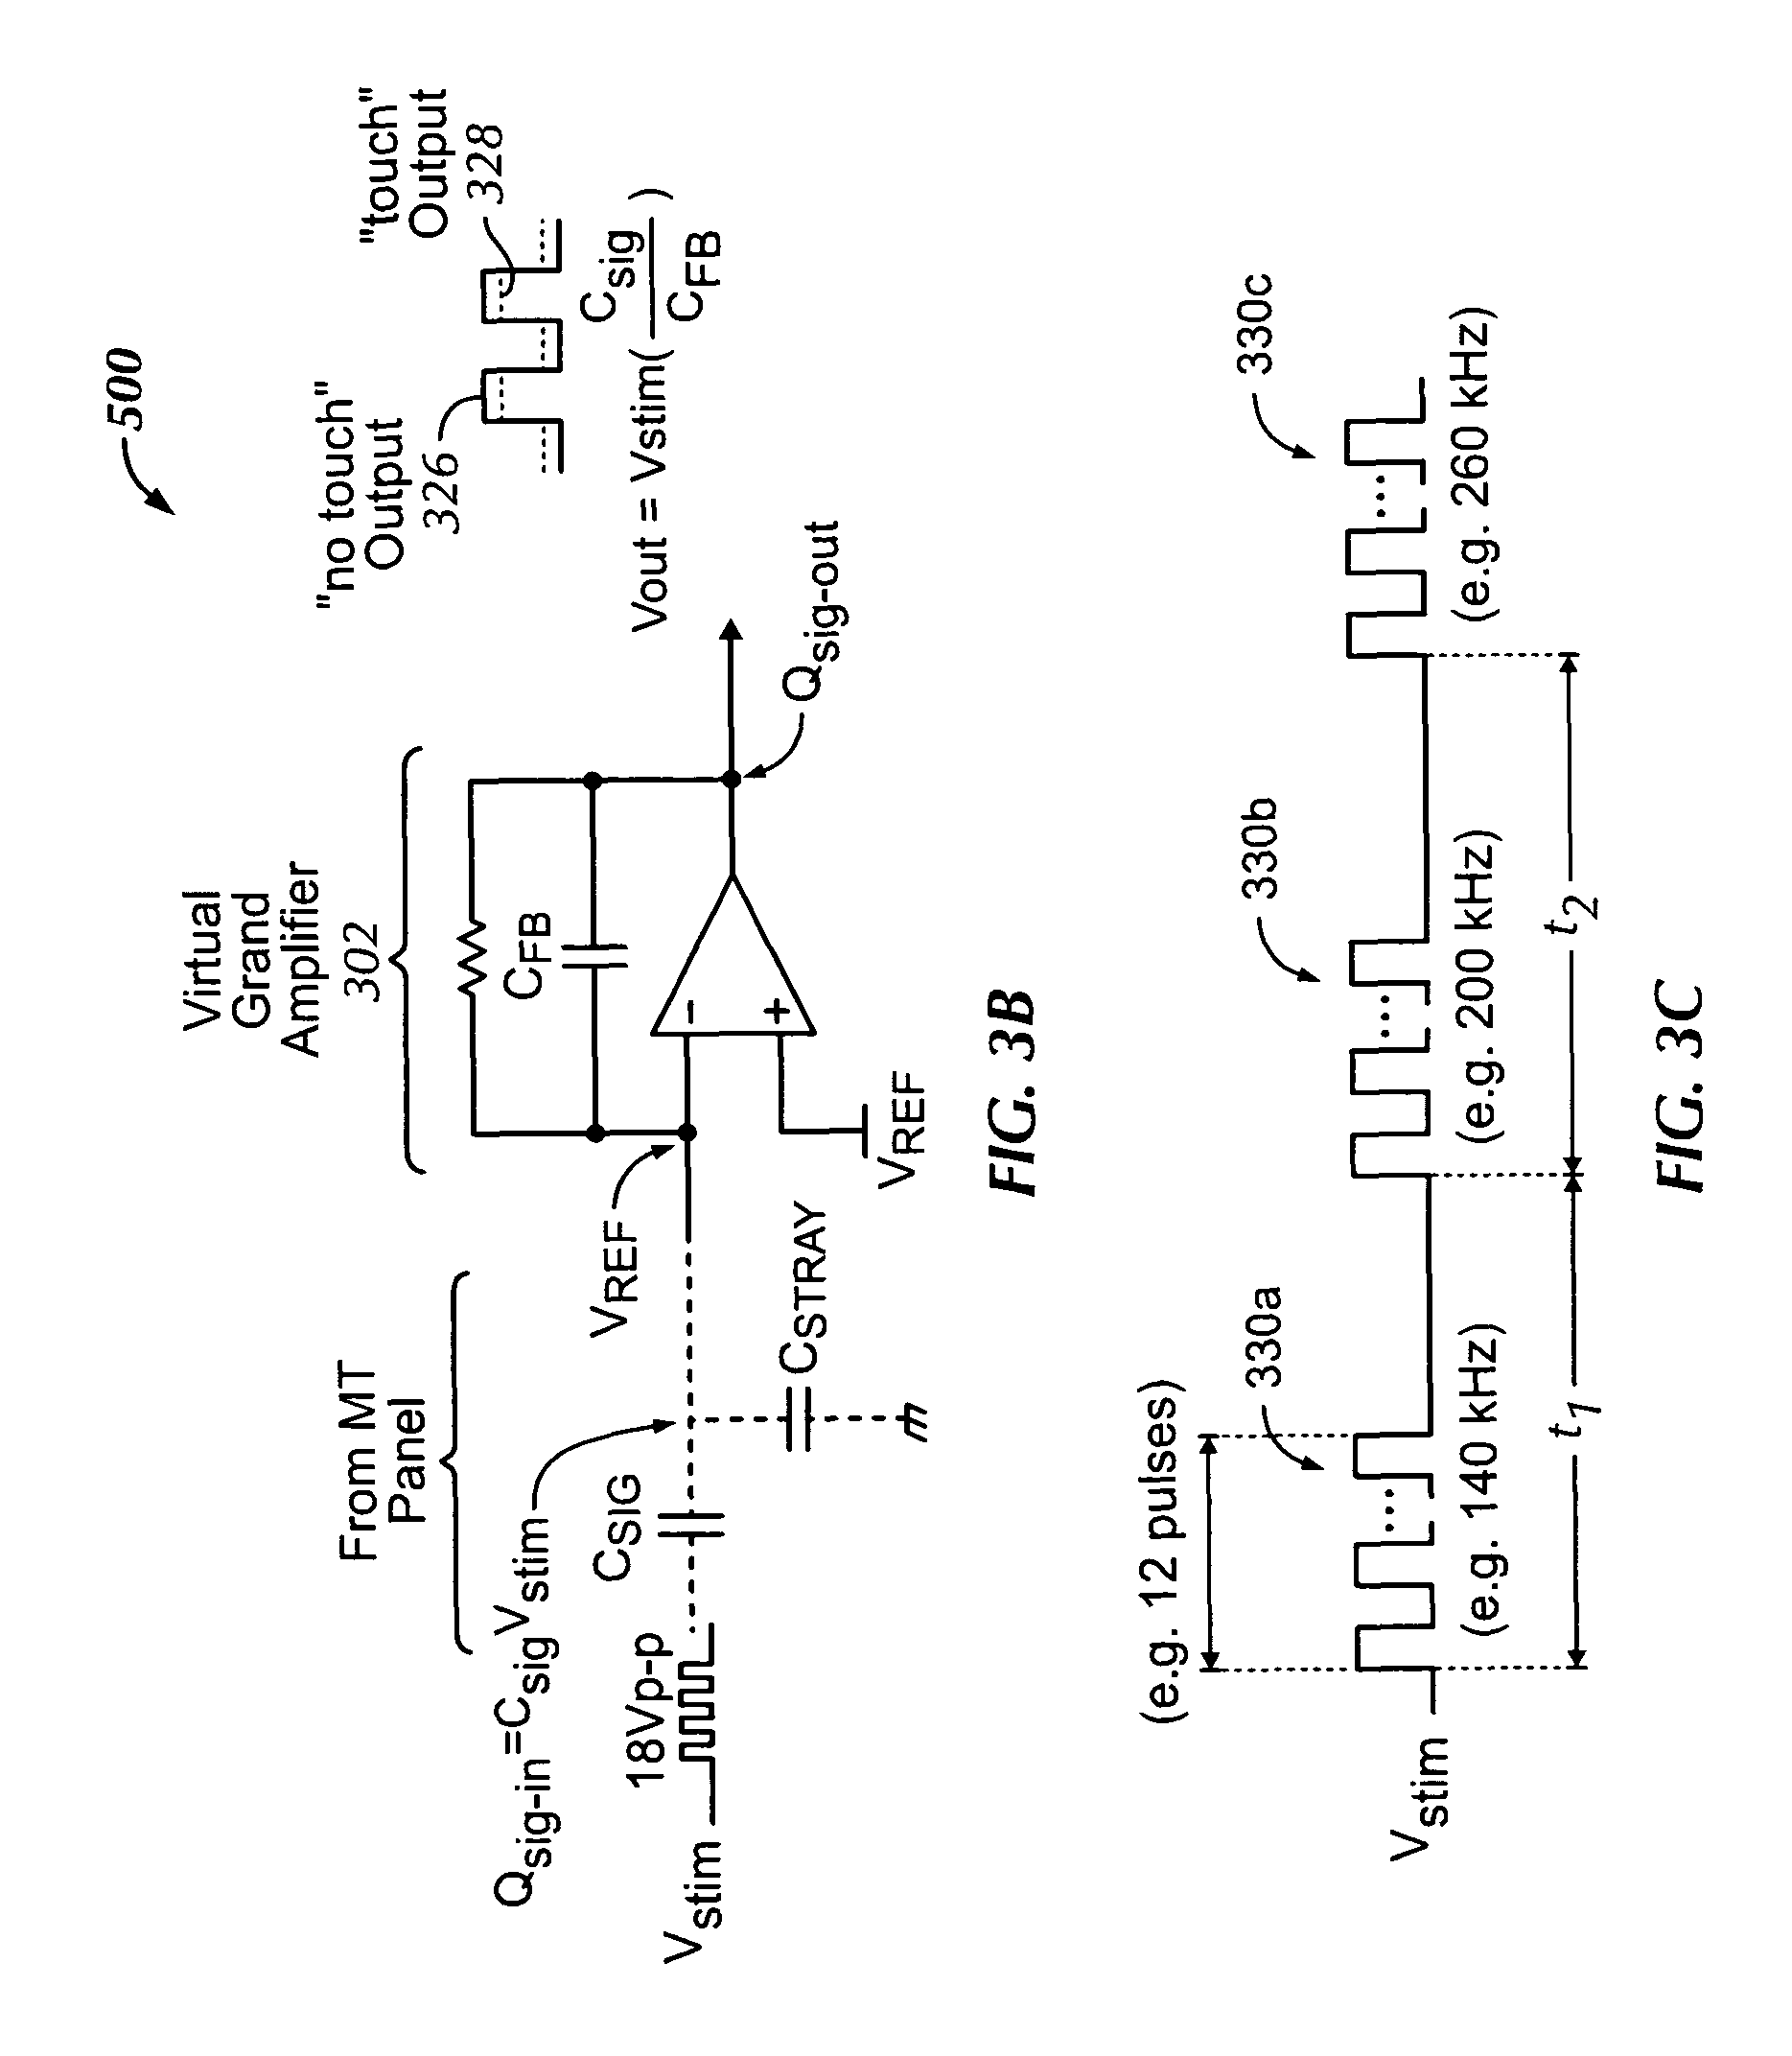 Patent US 8,125,456 B2